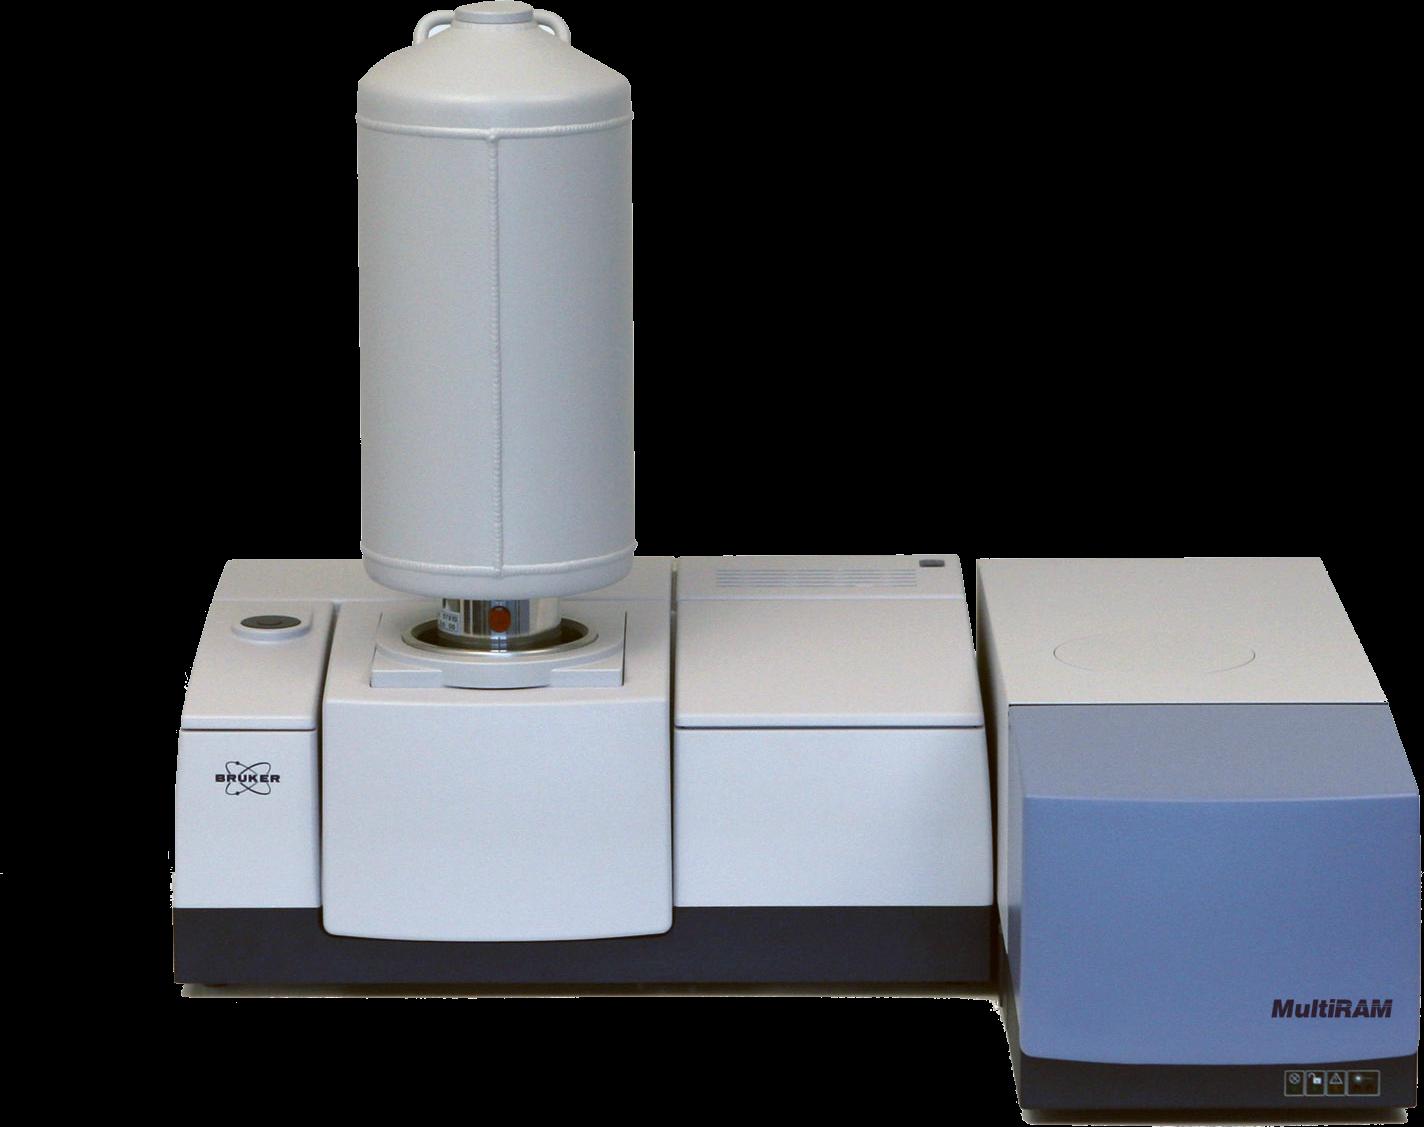 MultiRAM Stand Alone FT-Raman Spectrometer